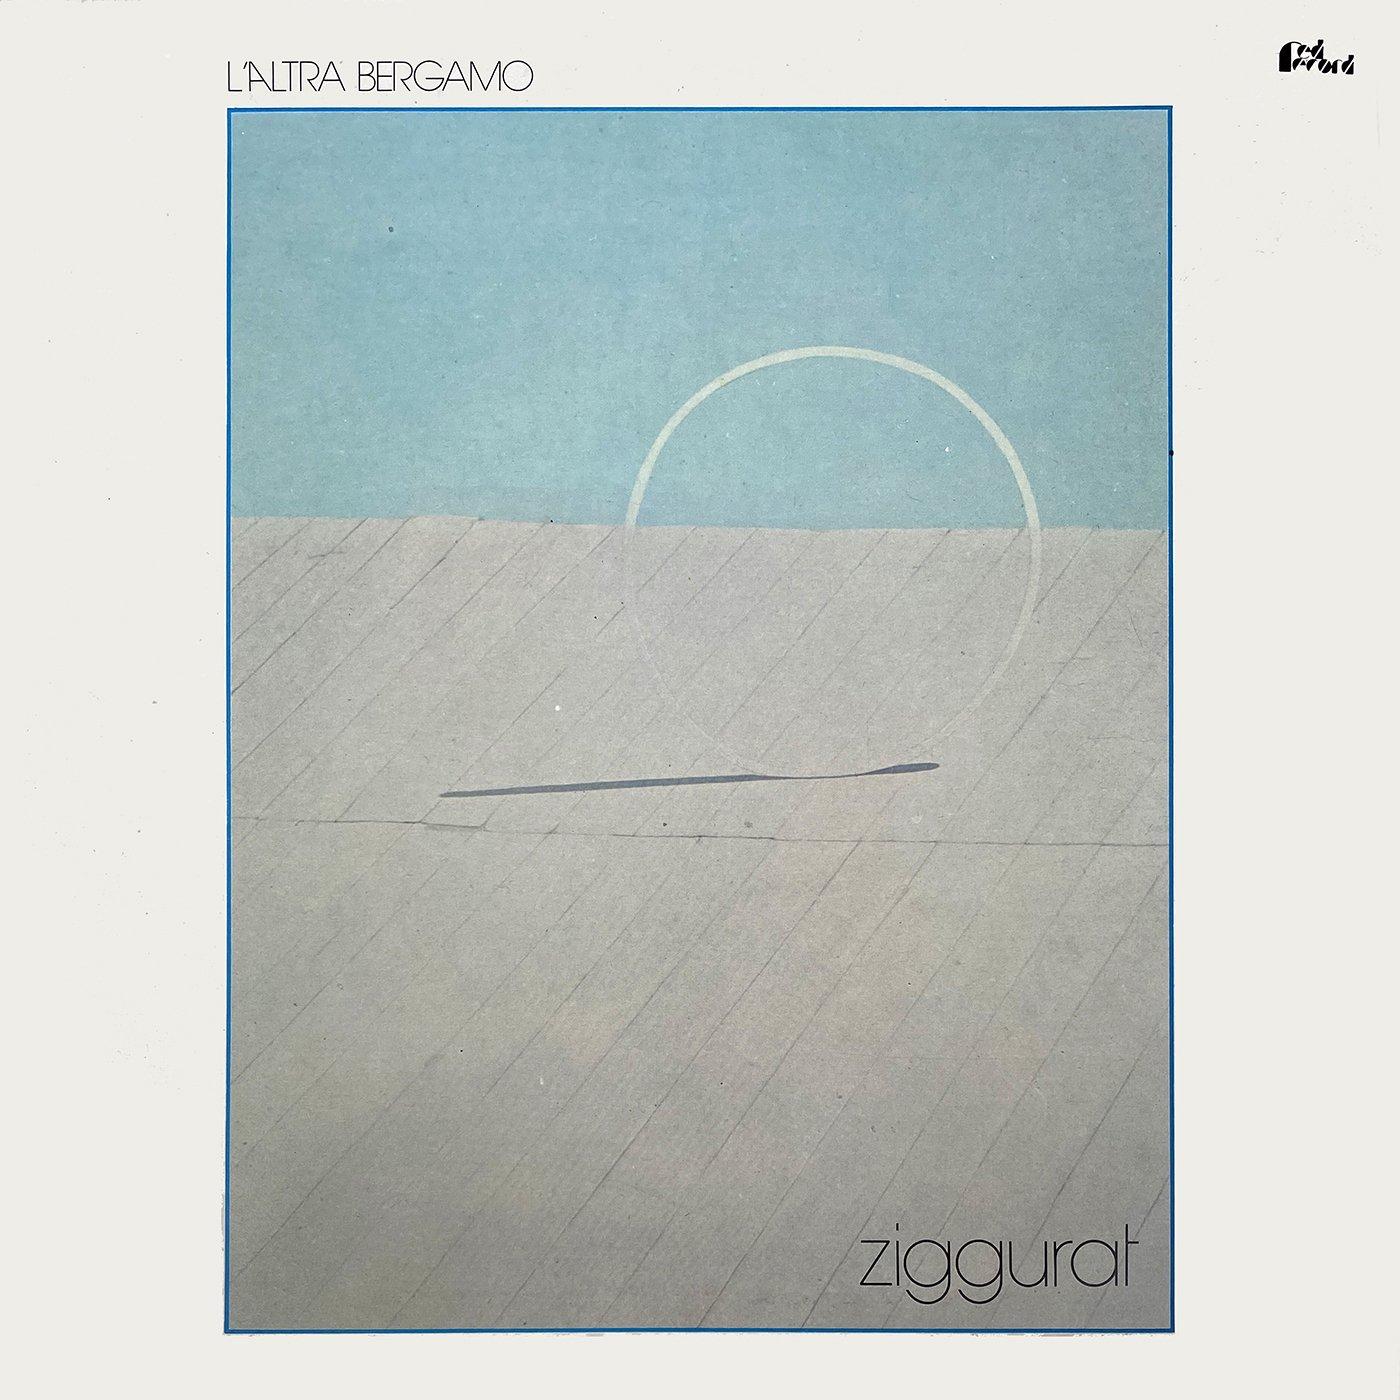 L'altra Bergamo - Ziggurat